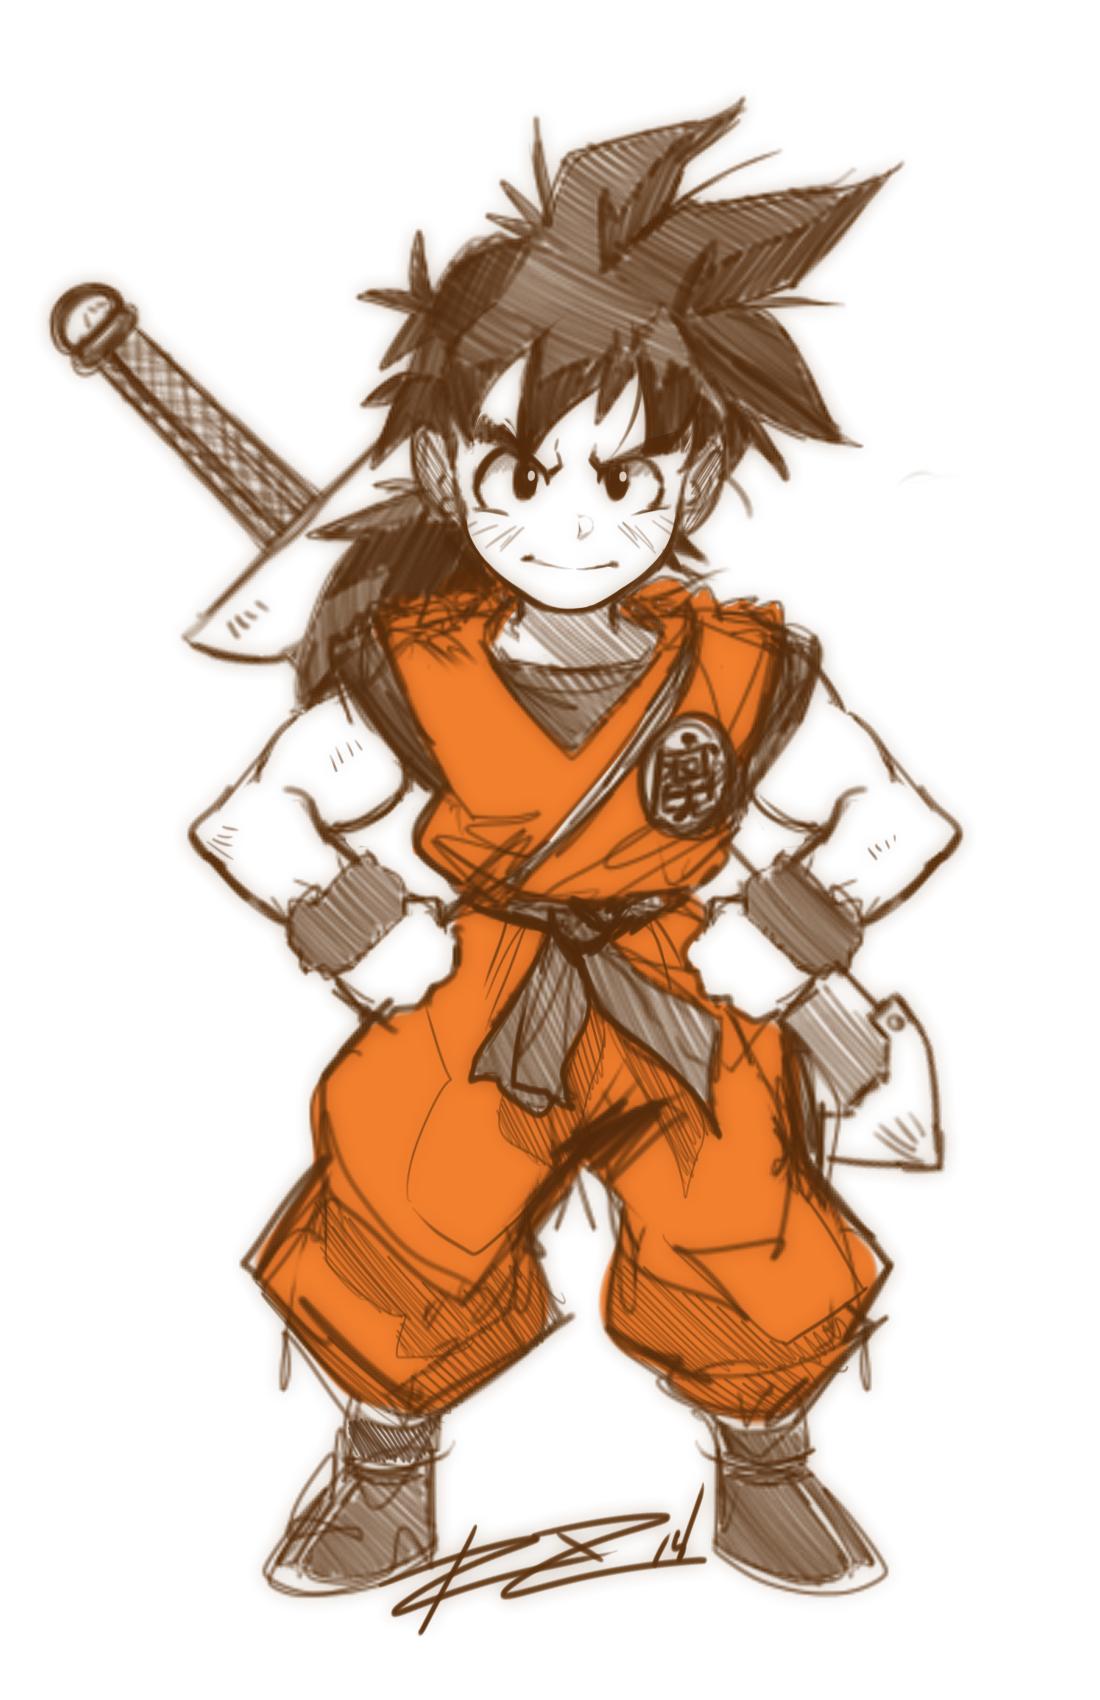 Dragon Ball Z Anime Characters : Dragon ball z cha lahhhhhhhhh by robaato viantart